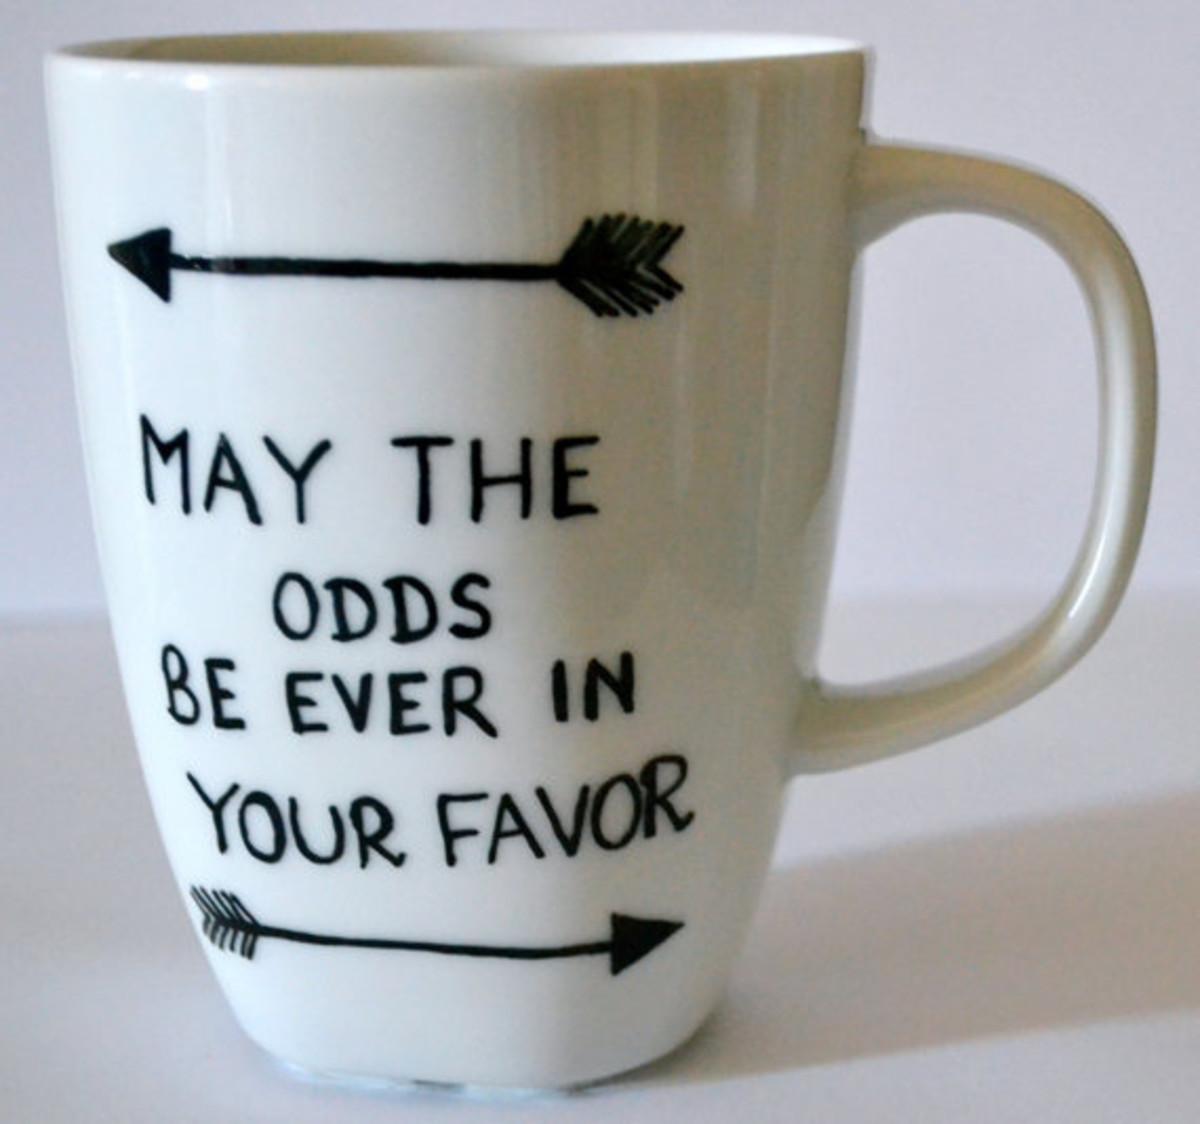 The Hunger Games mug